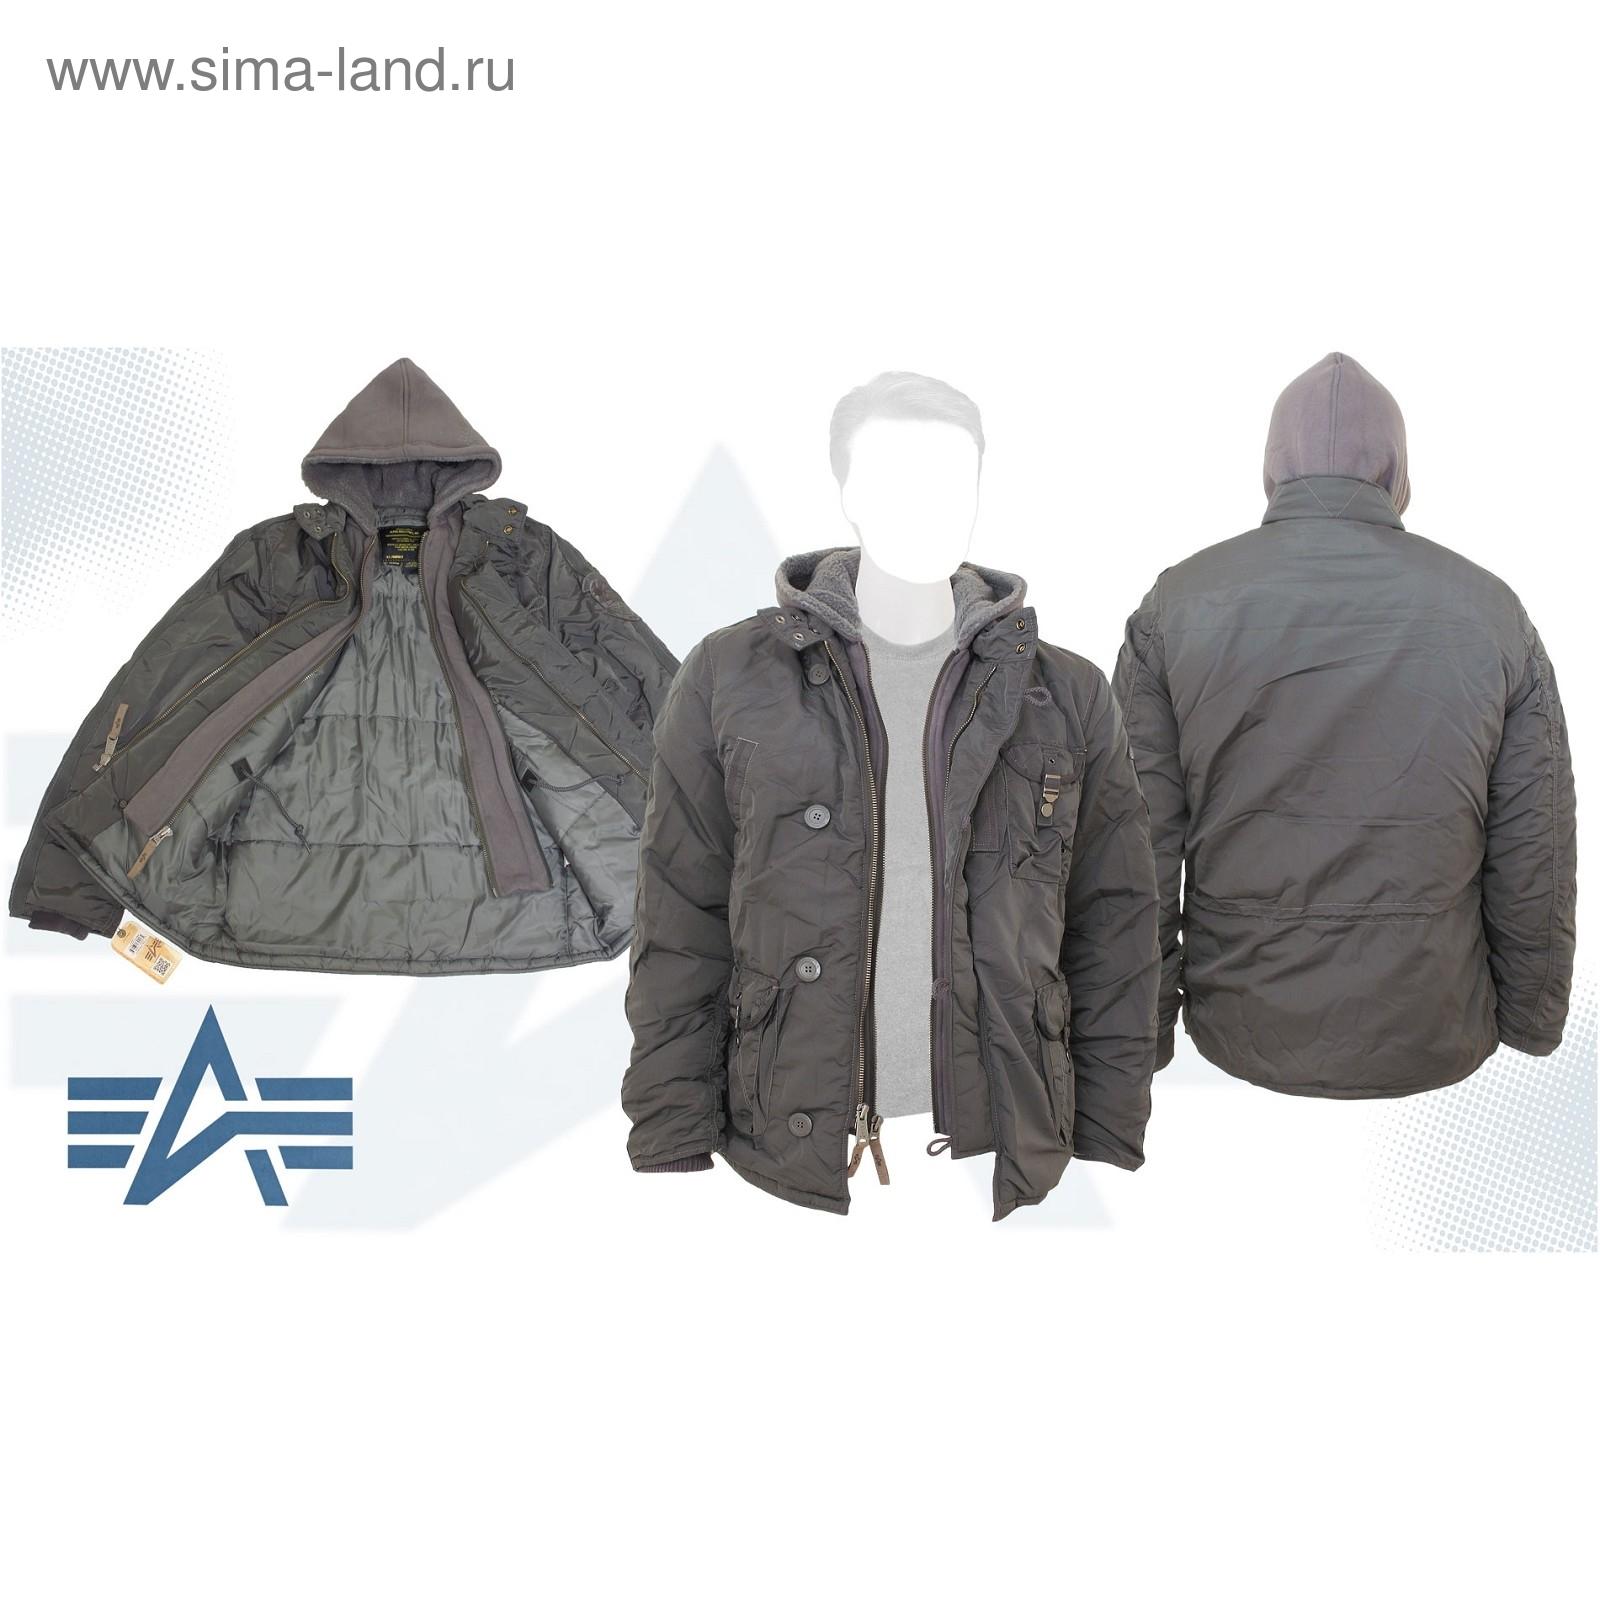 Alpha industries jacket cobbs ii